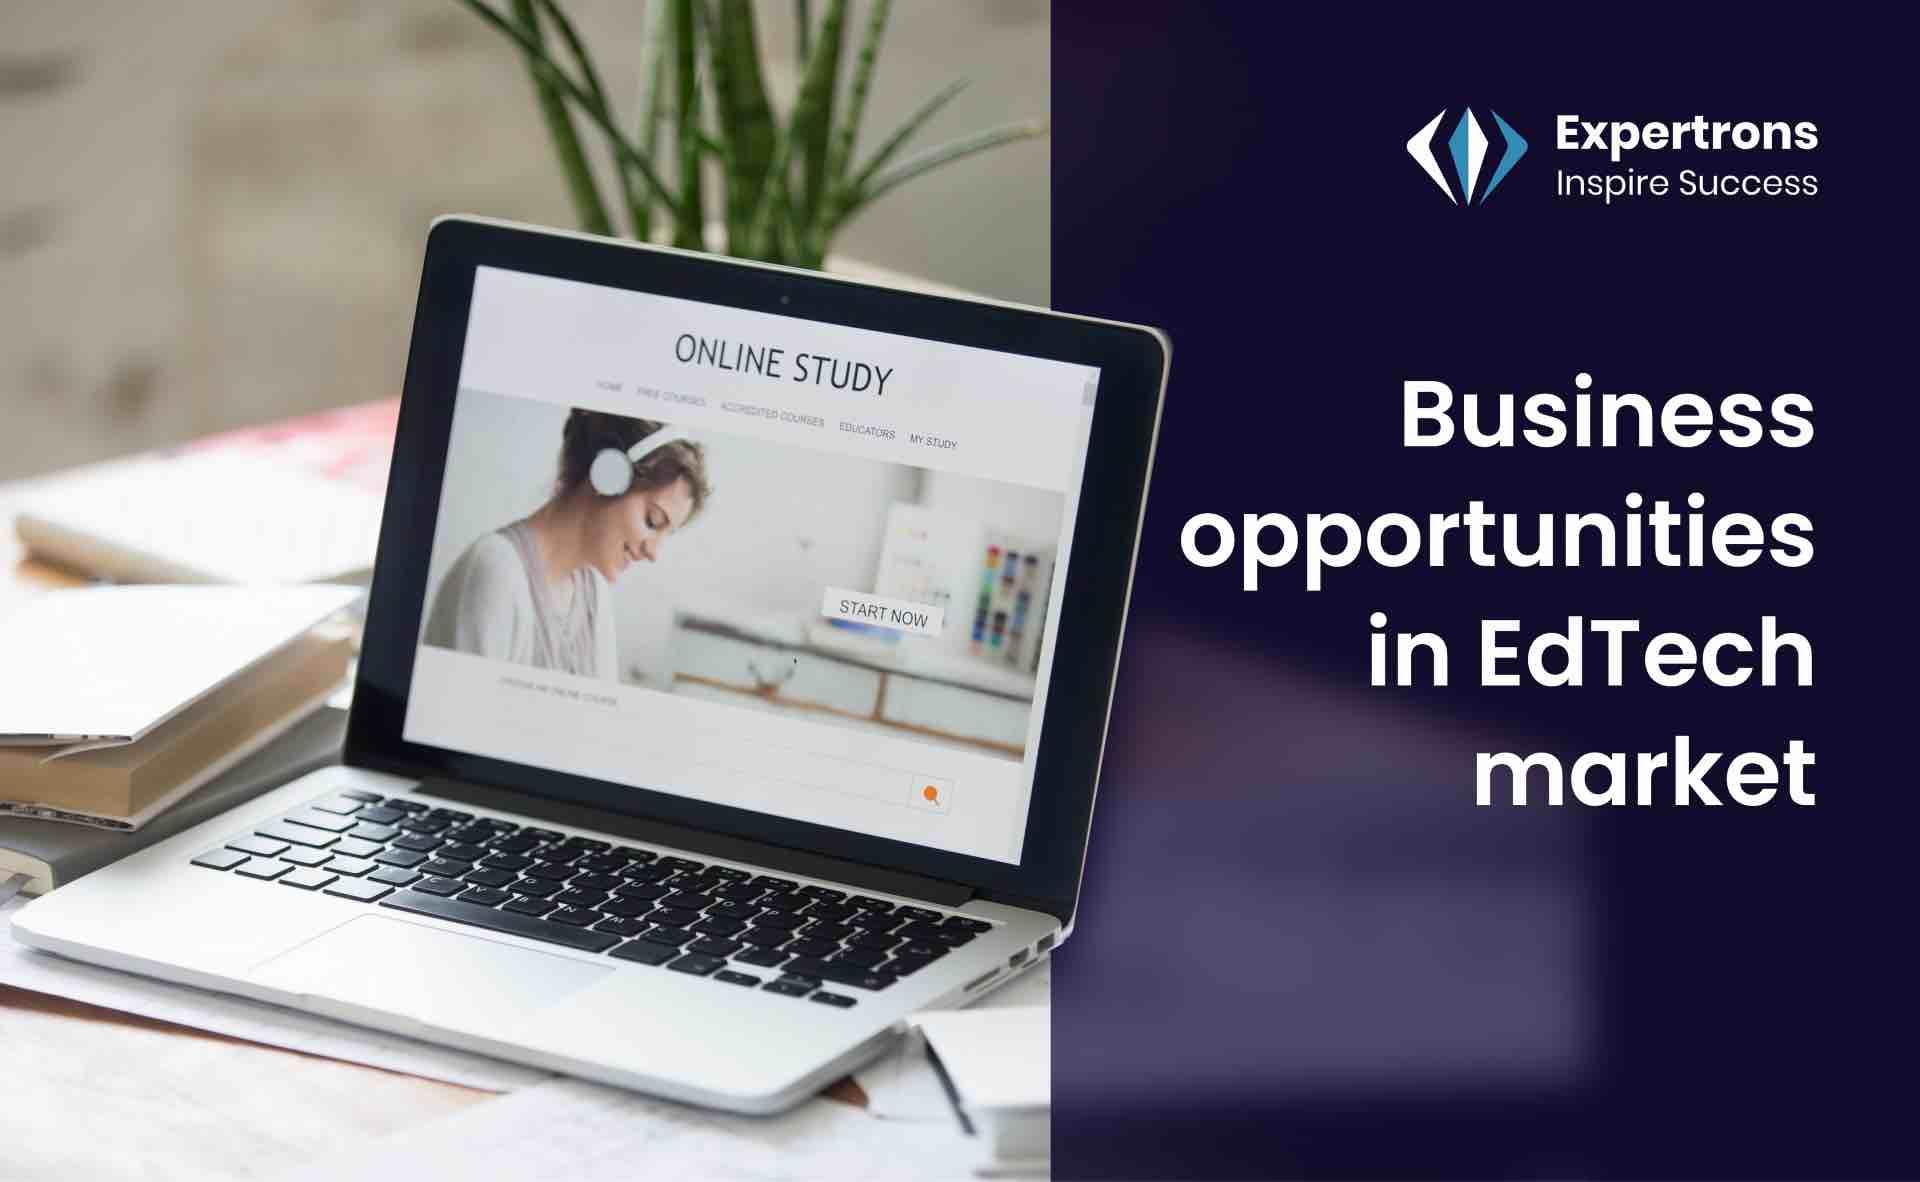 Business opportunity, EdTech, EdTech market, Videobot, AI videobot, career guidance, business opportunity, edtech industry